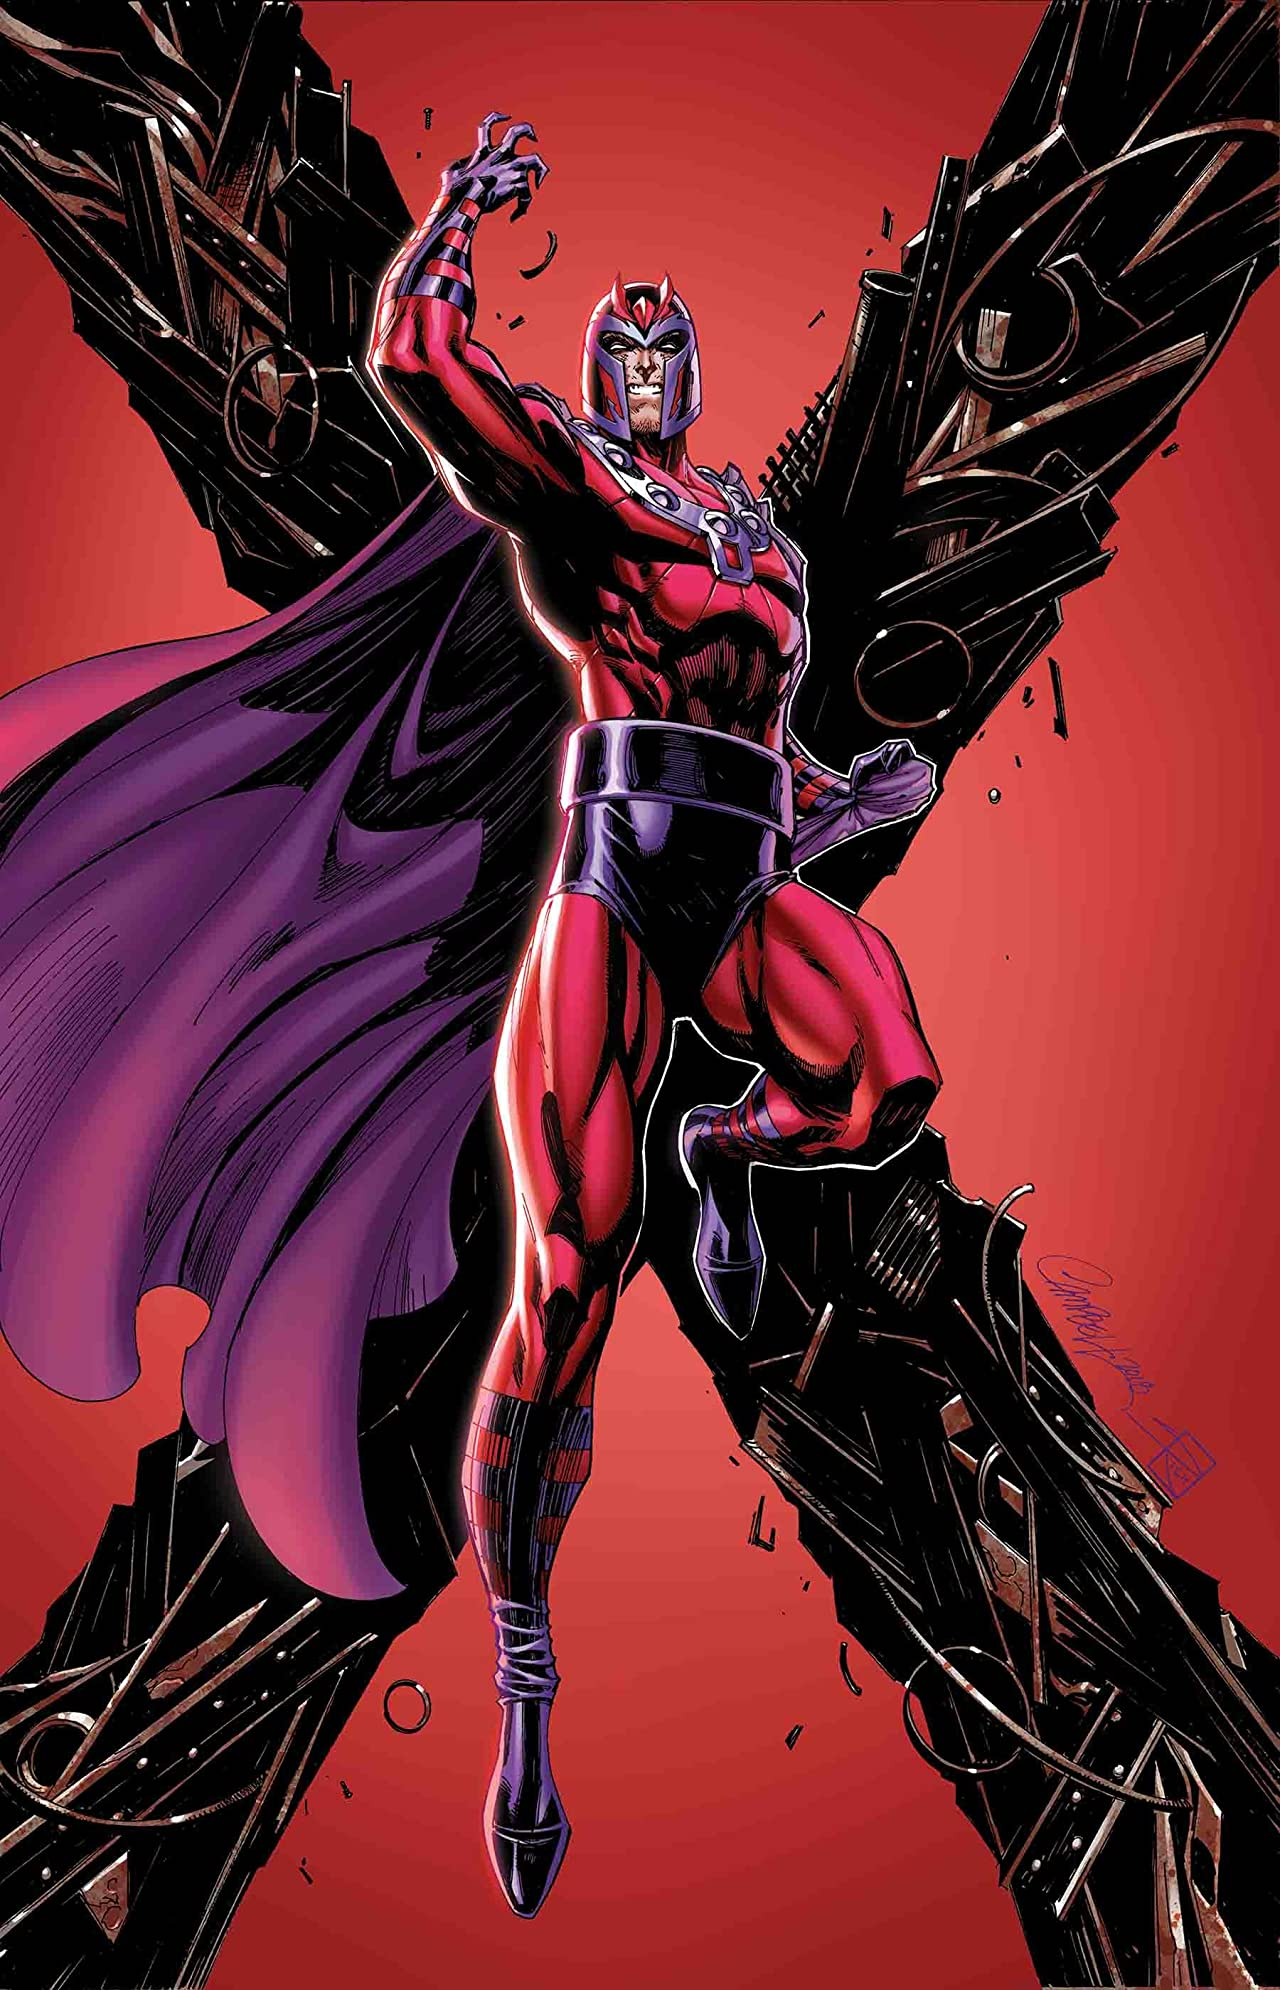 X-Men: Black - Magneto (2018) #1